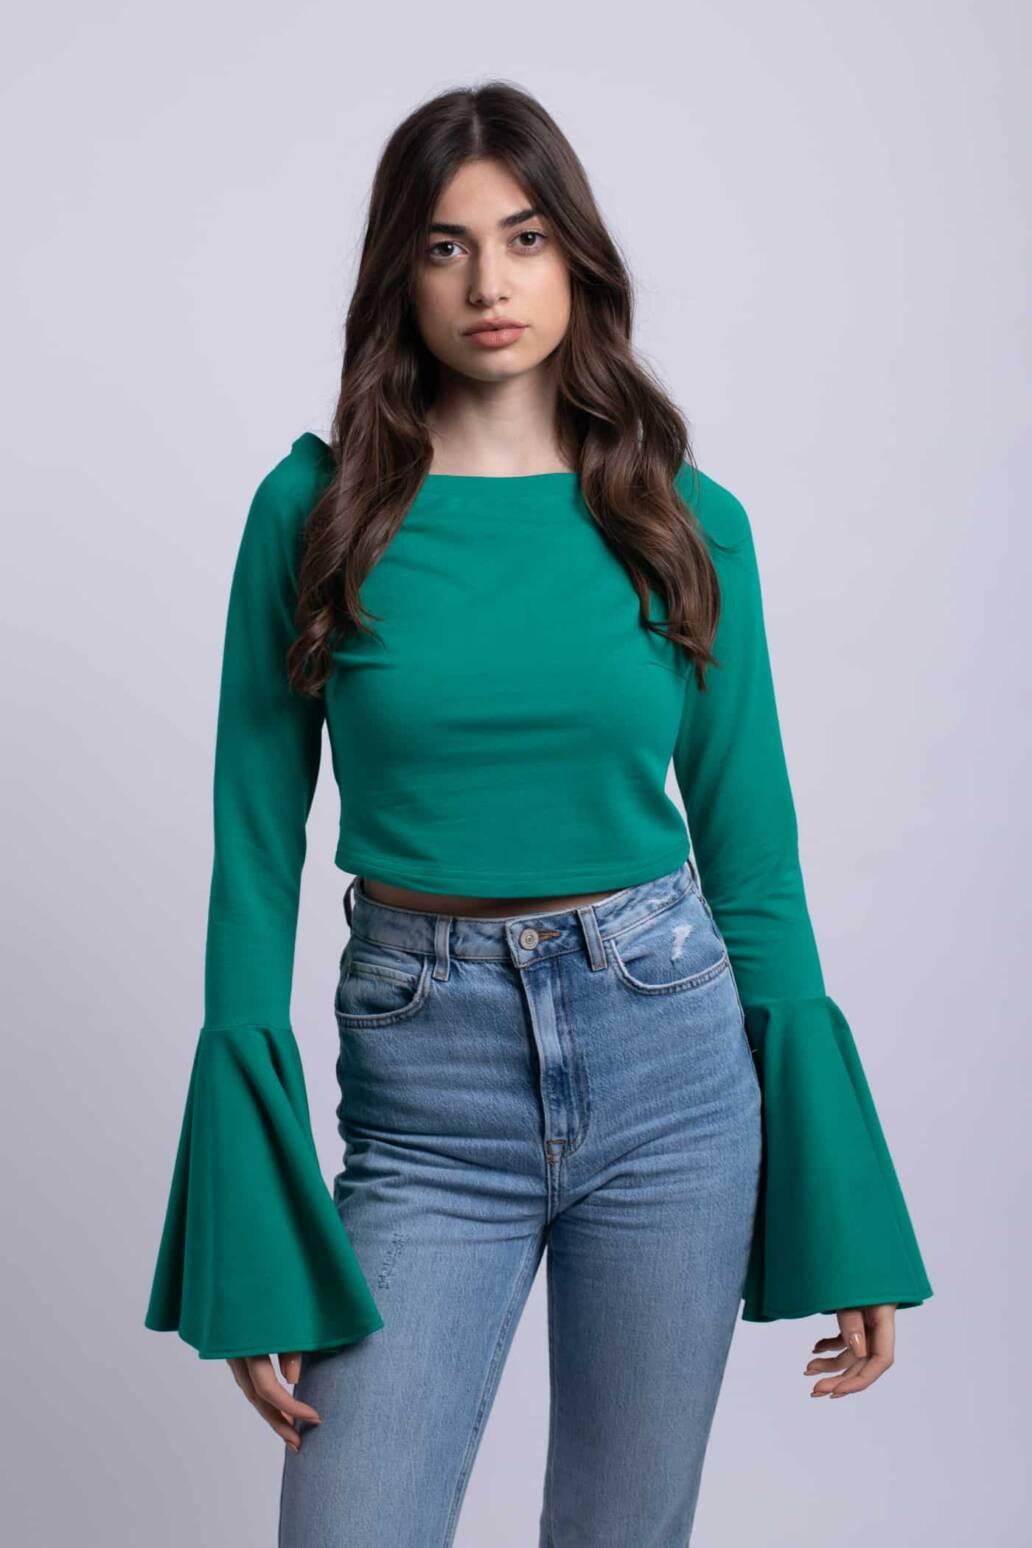 bluza verde crop top uai